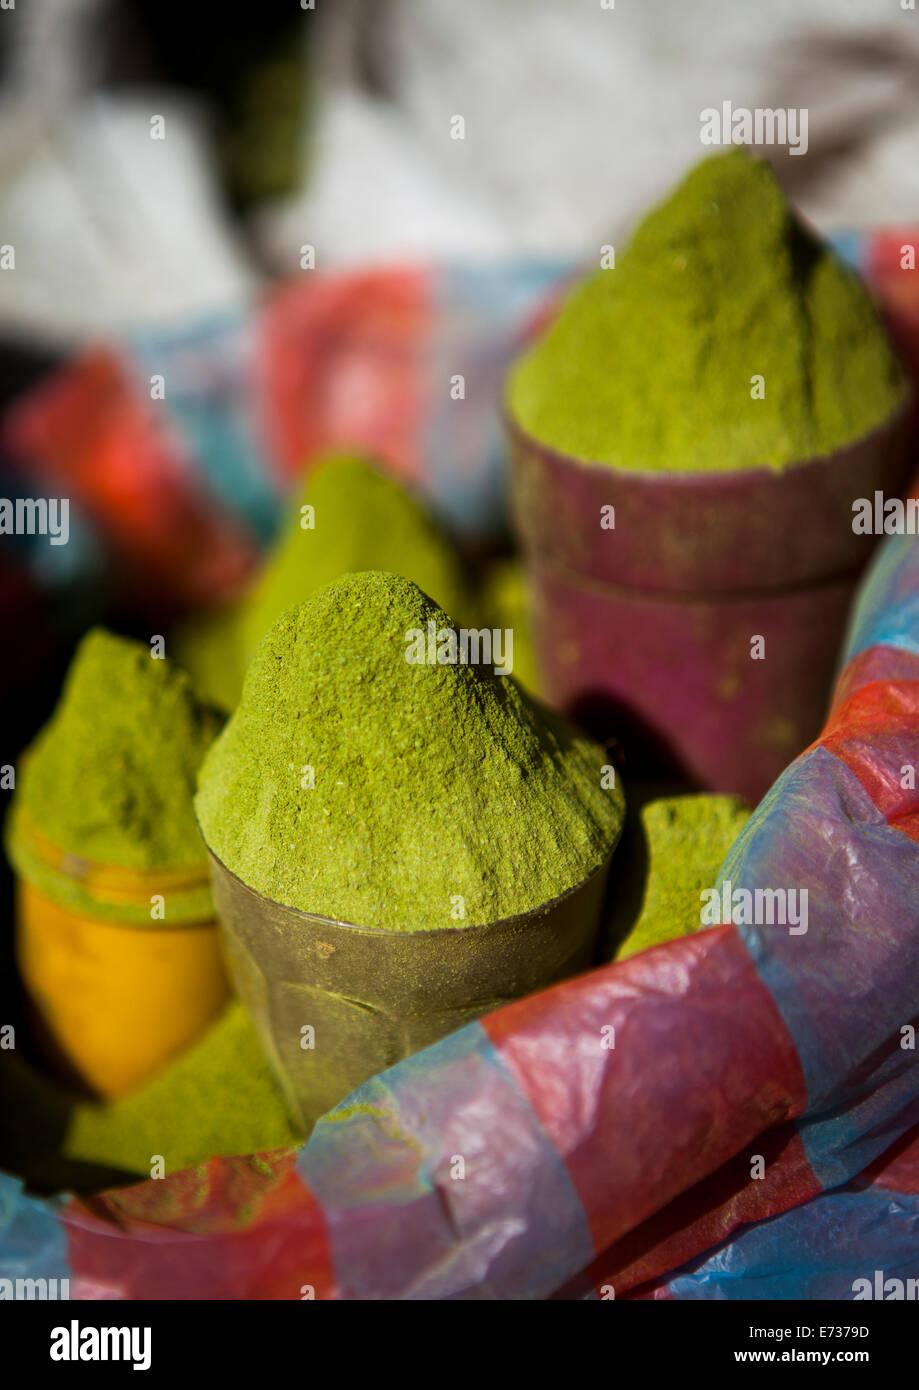 Assayta Afar Market, Ethiopia - Stock Image